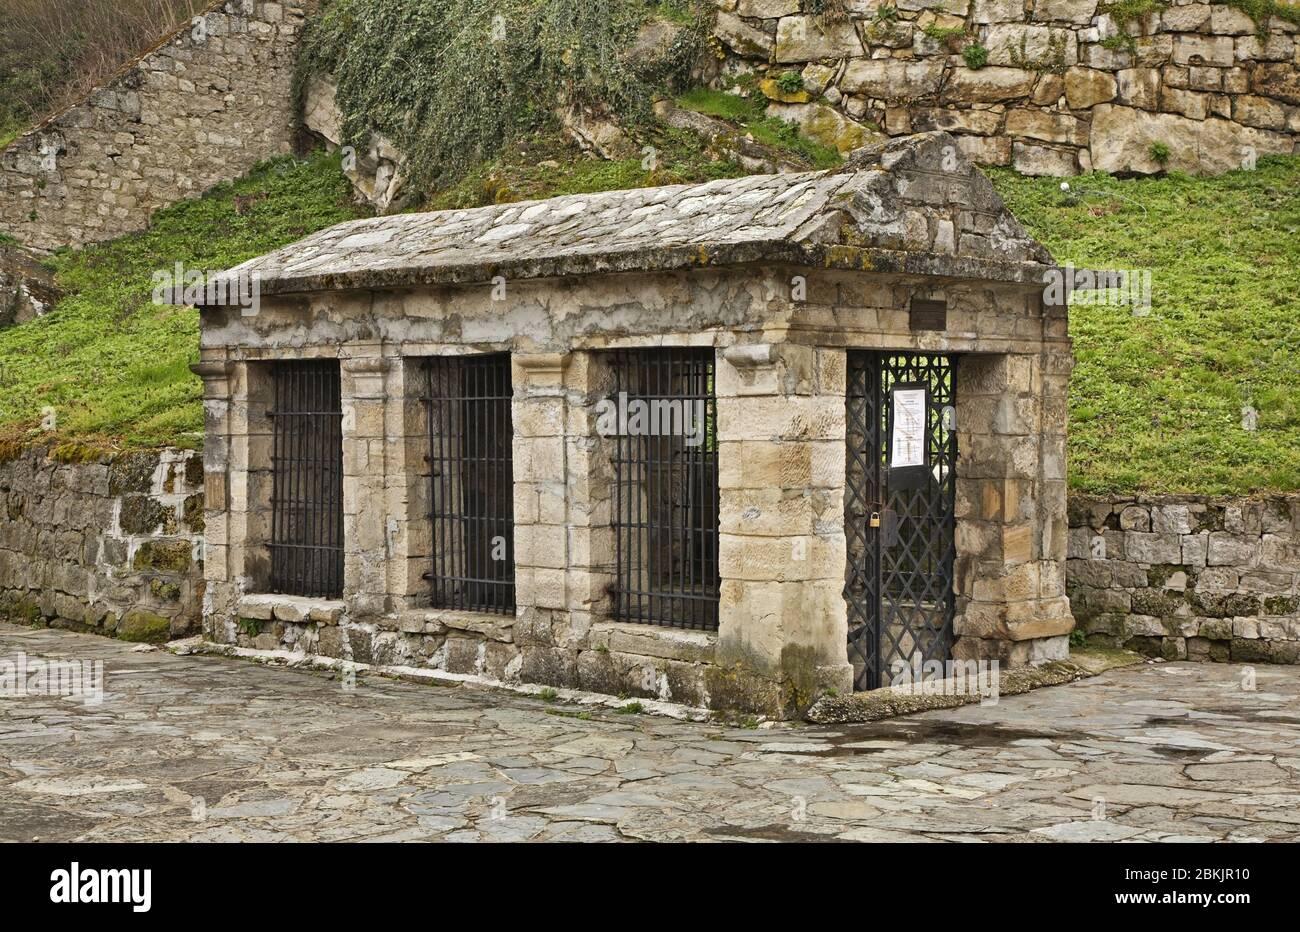 Entrada a las catacumbas de Jajce. Bosnia y Herzegovina Foto de stock